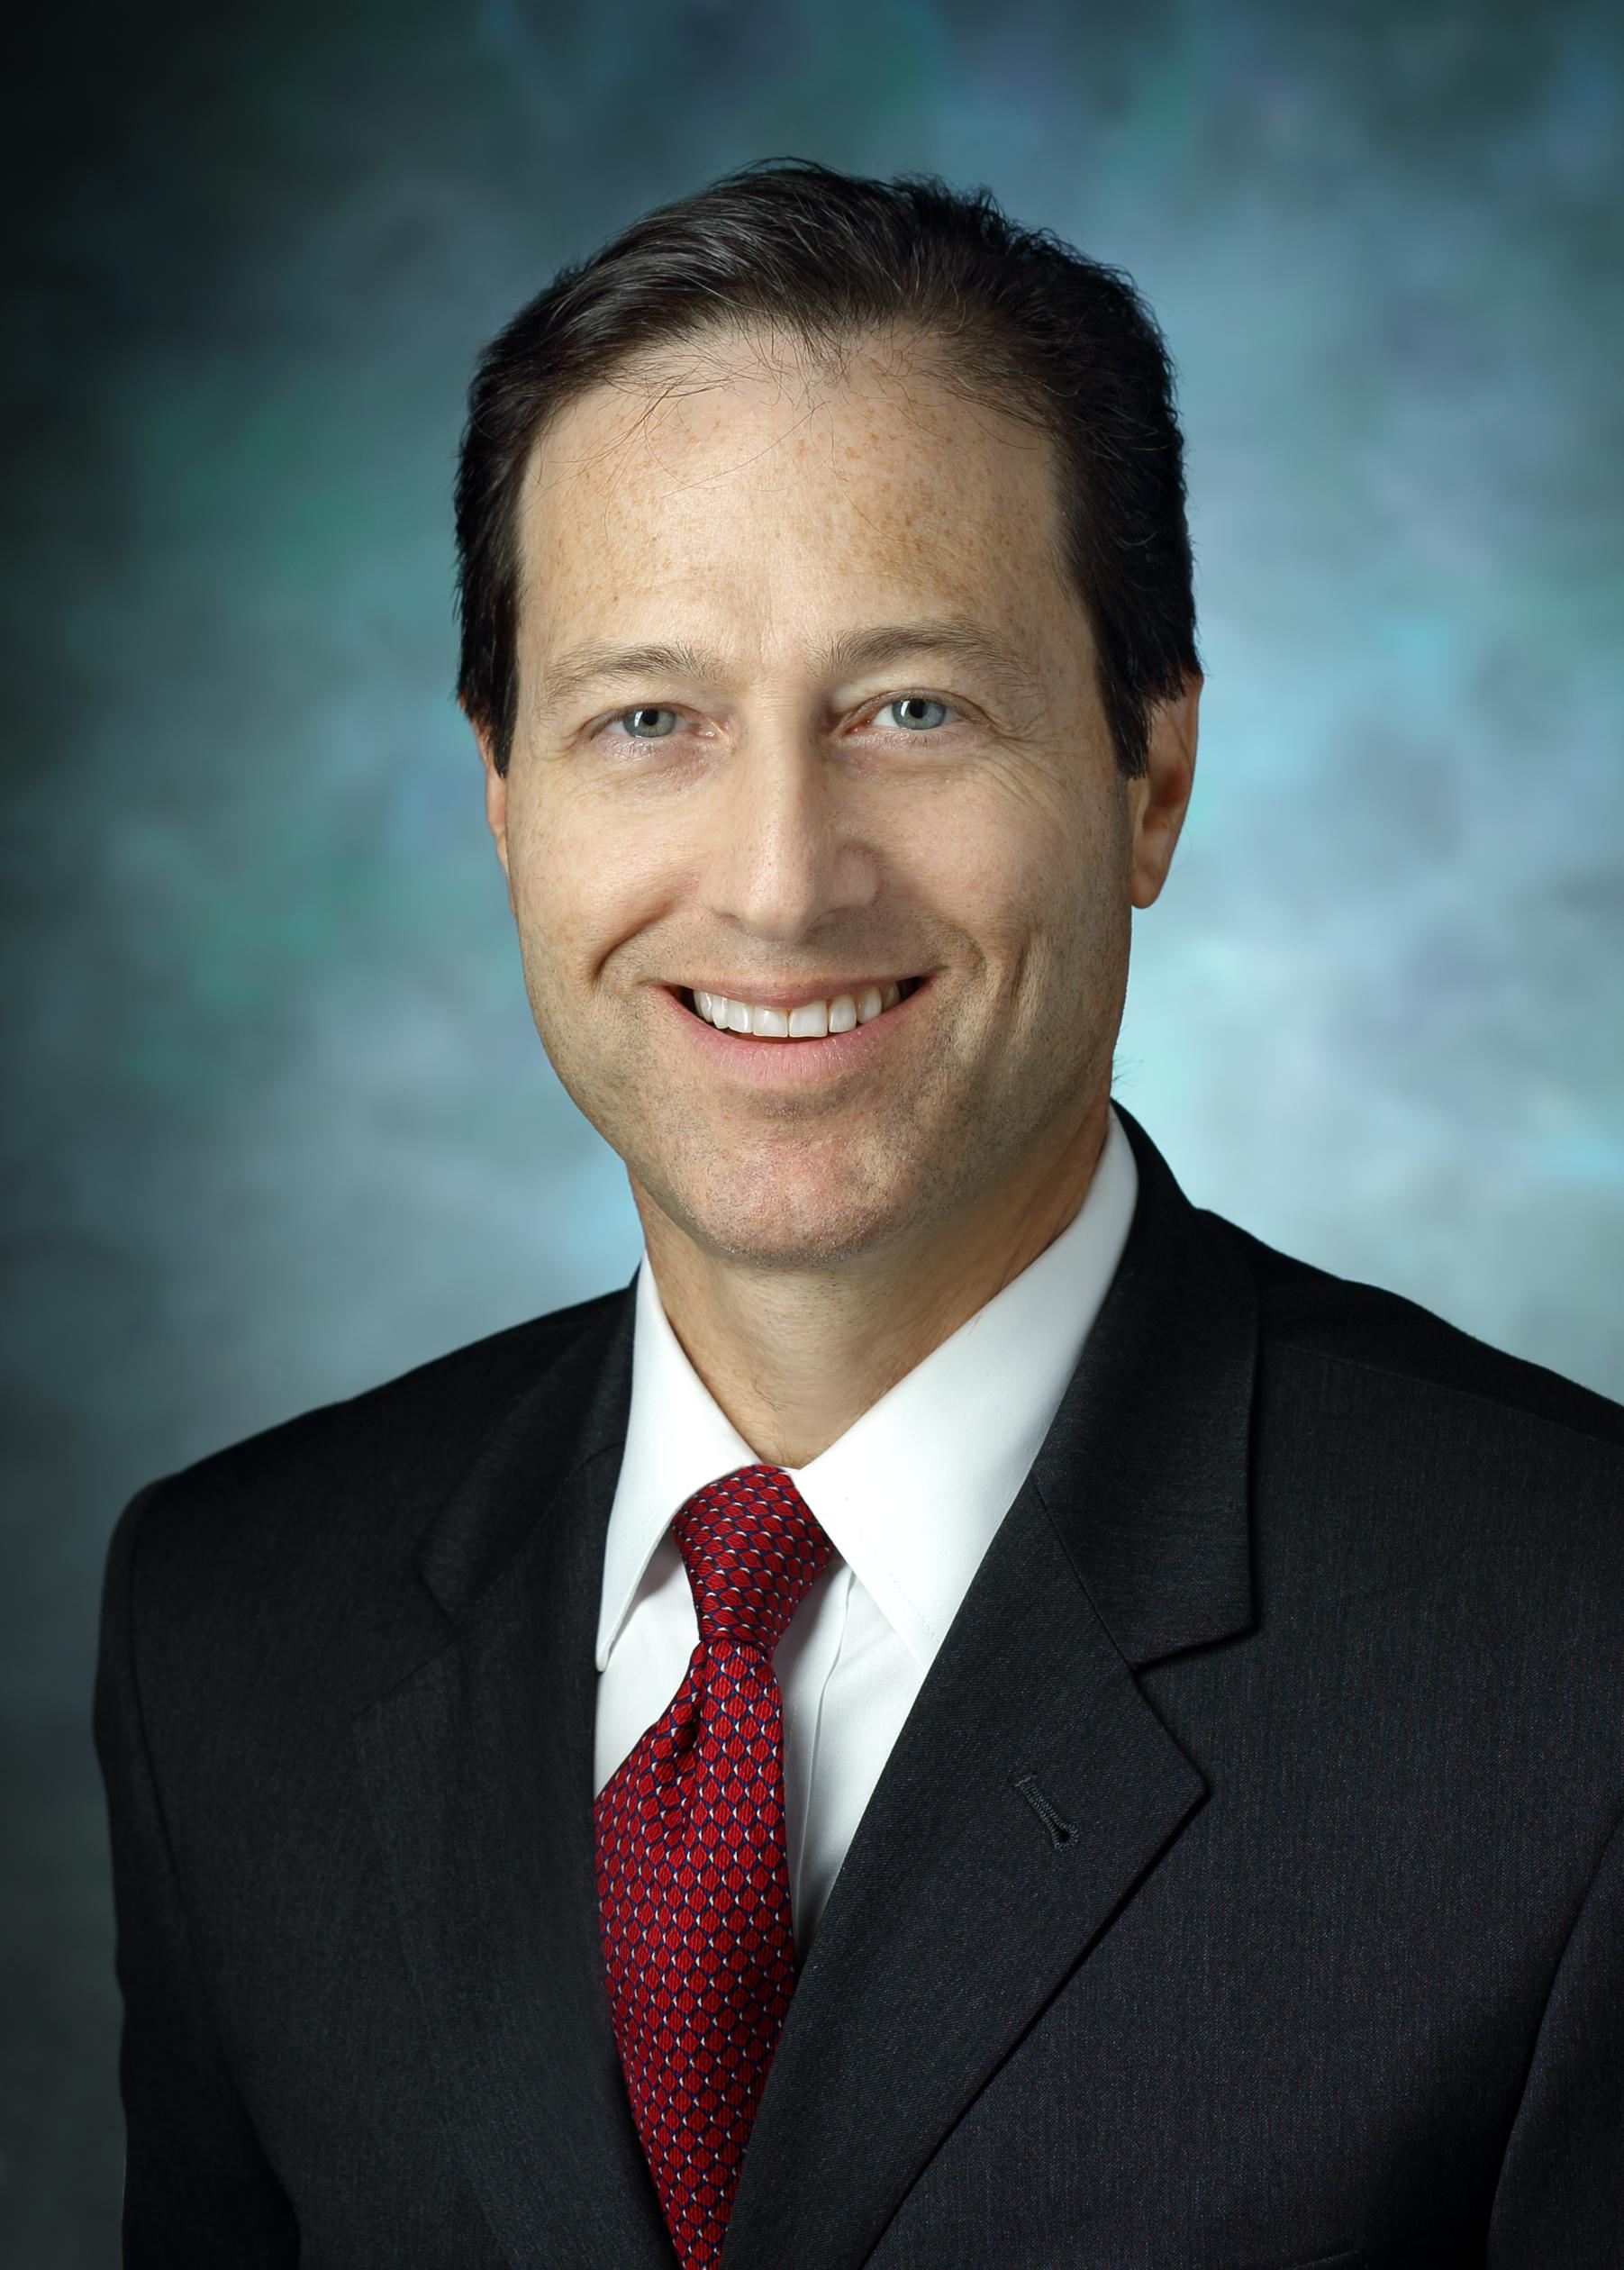 Richard Safeer